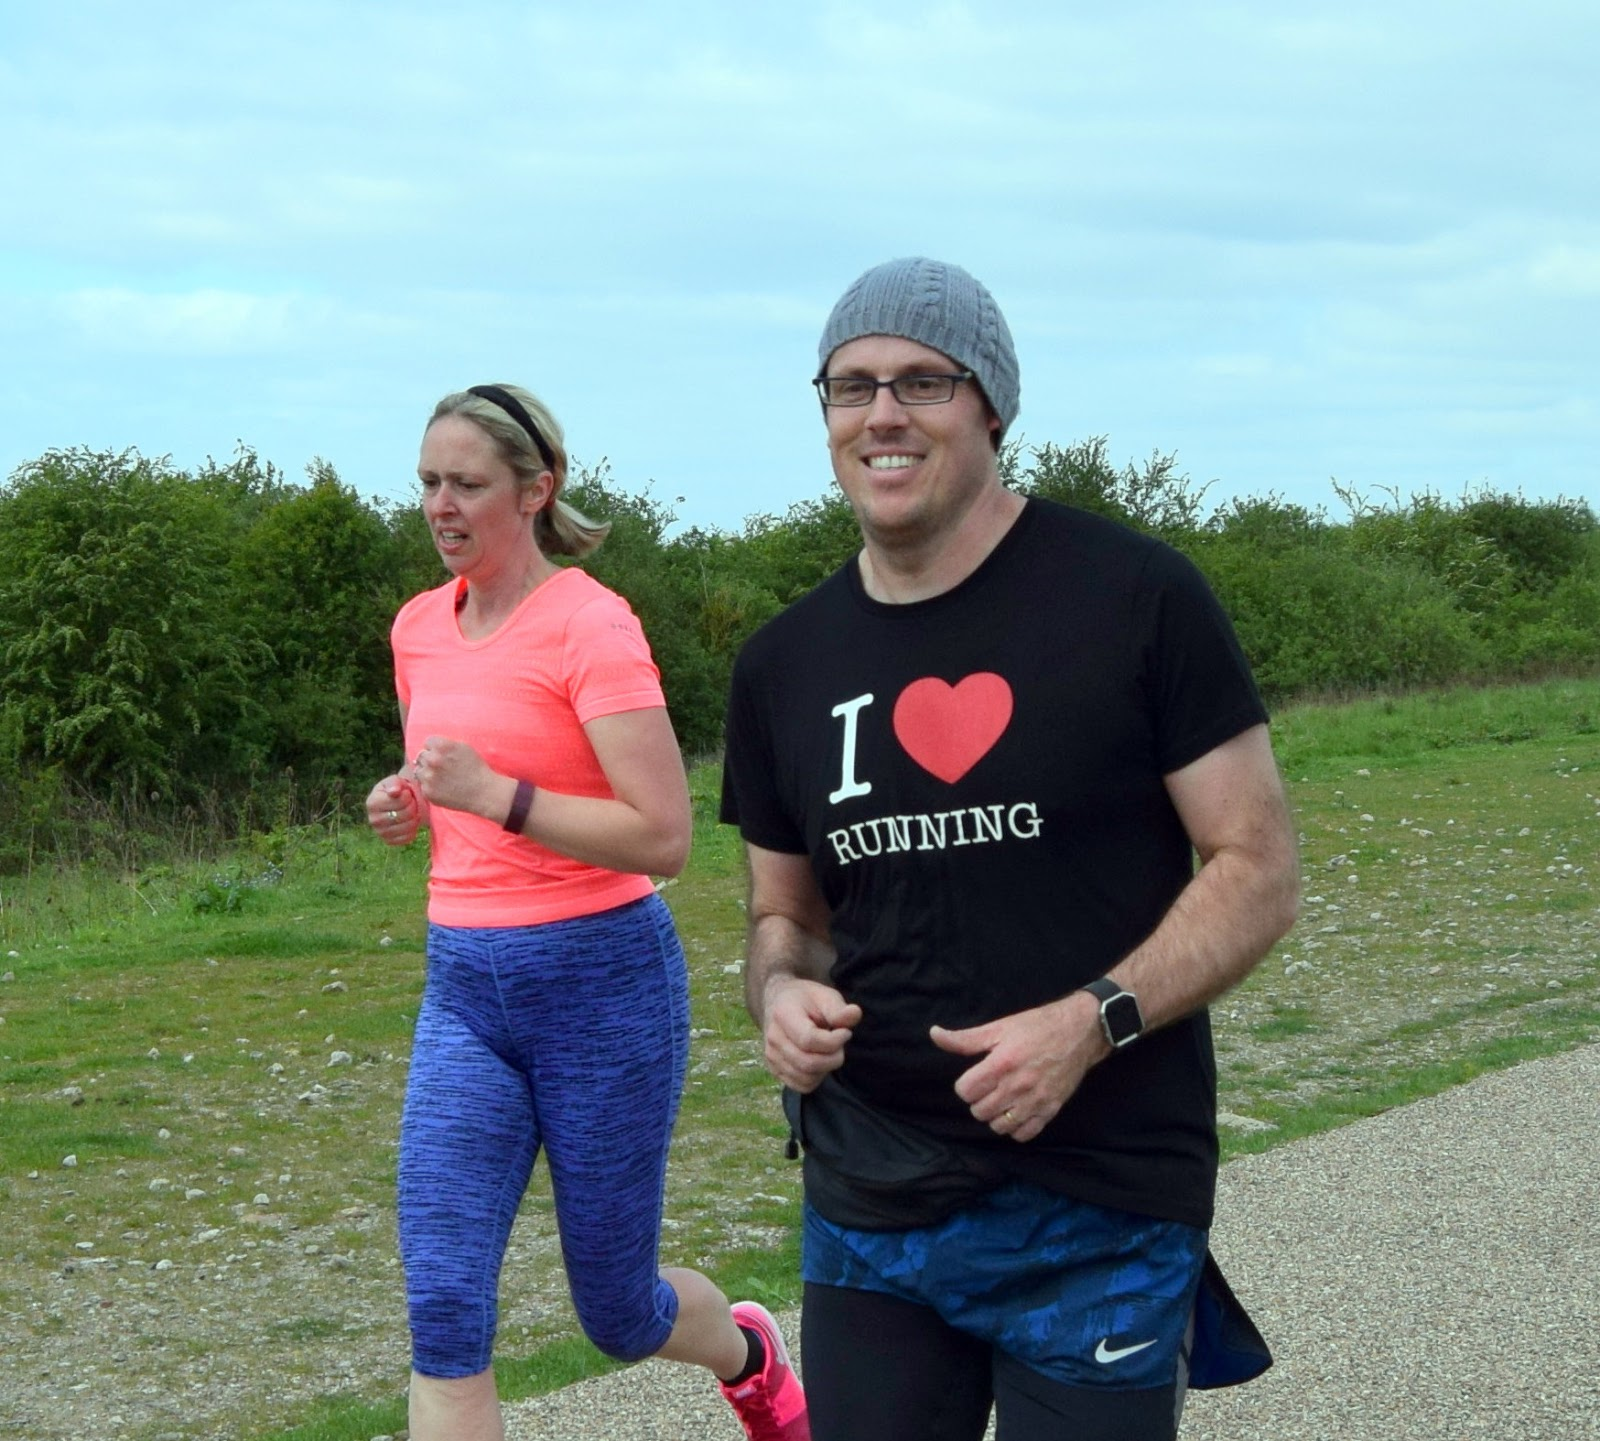 I love running t-shirt!!